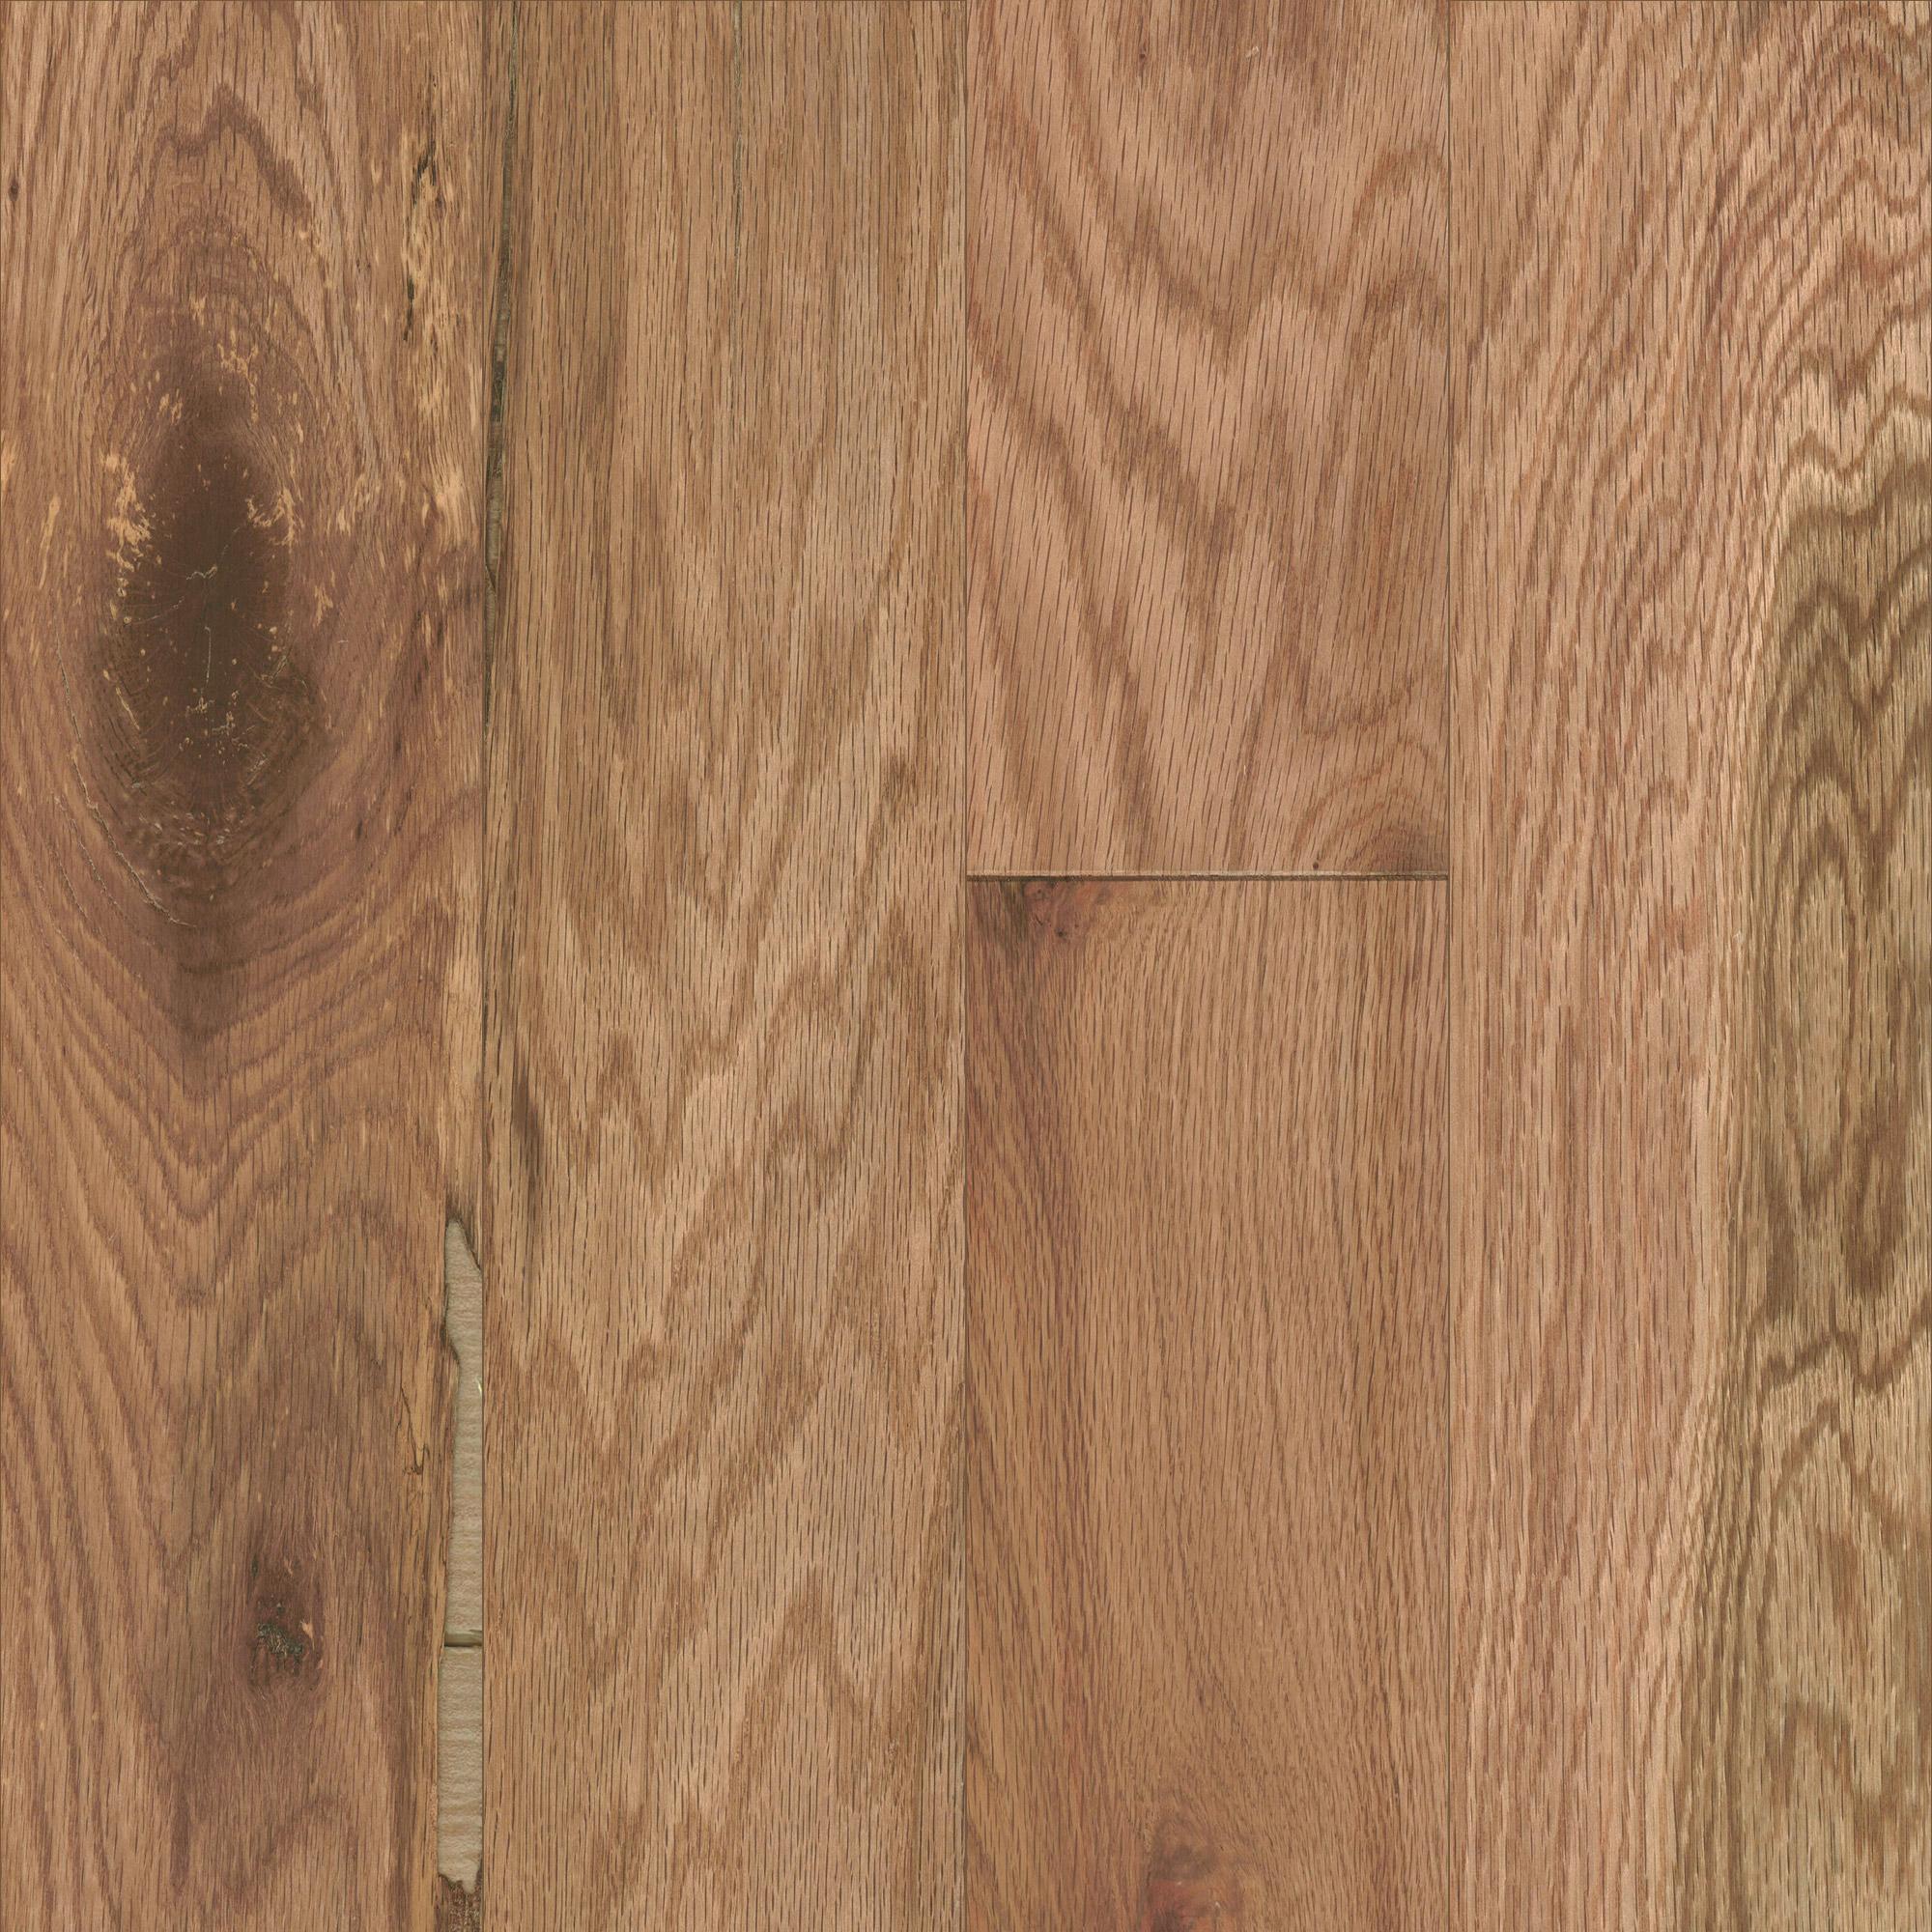 cost to install floating engineered hardwood floor of mullican ridgecrest red oak natural 1 2 thick 5 wide engineered intended for mullican ridgecrest red oak natural 1 2 thick 5 wide engineered hardwood flooring